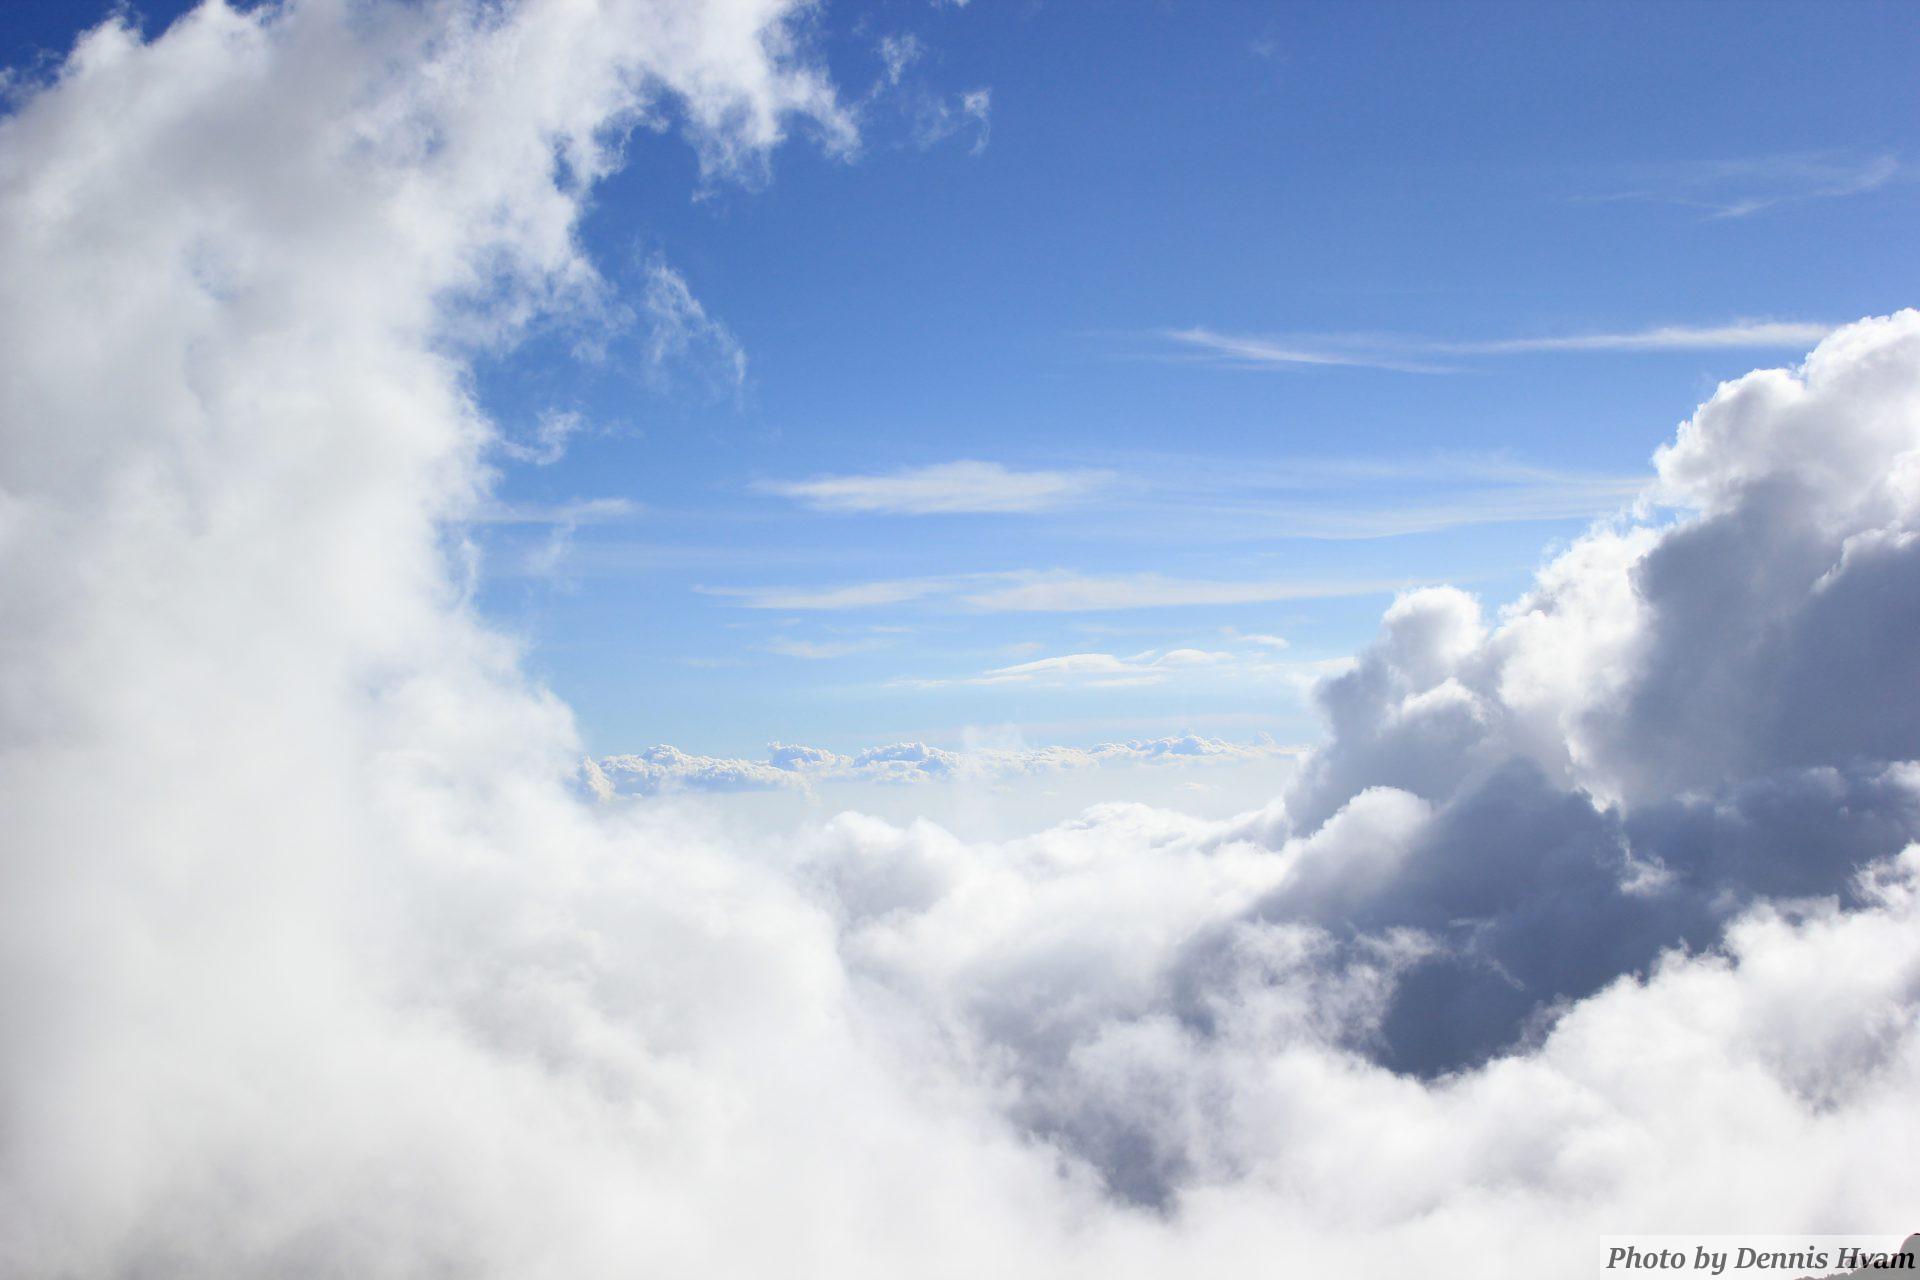 Birdsview Kilimanjaro